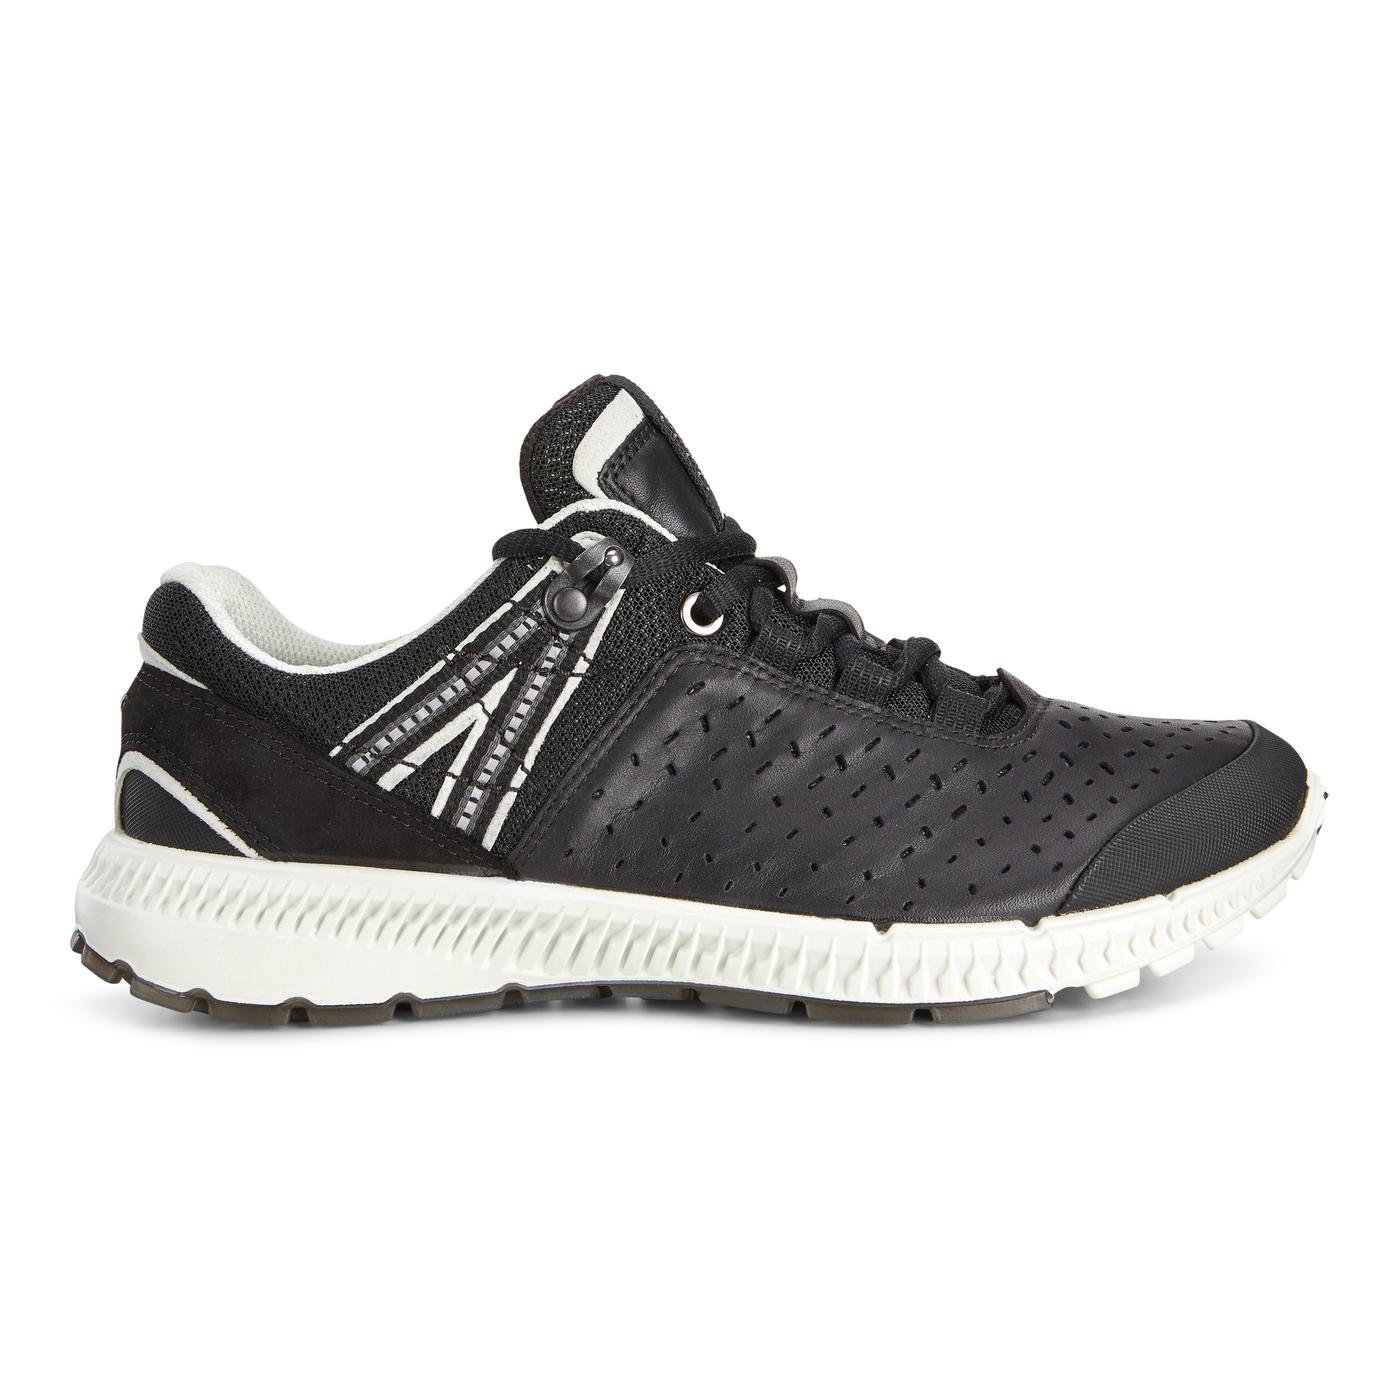 muoti tyylejä uusi ulkonäkö paremmin ECCO Intrinsic TR Walk | Women's Hiking Shoes | ECCO® Shoes